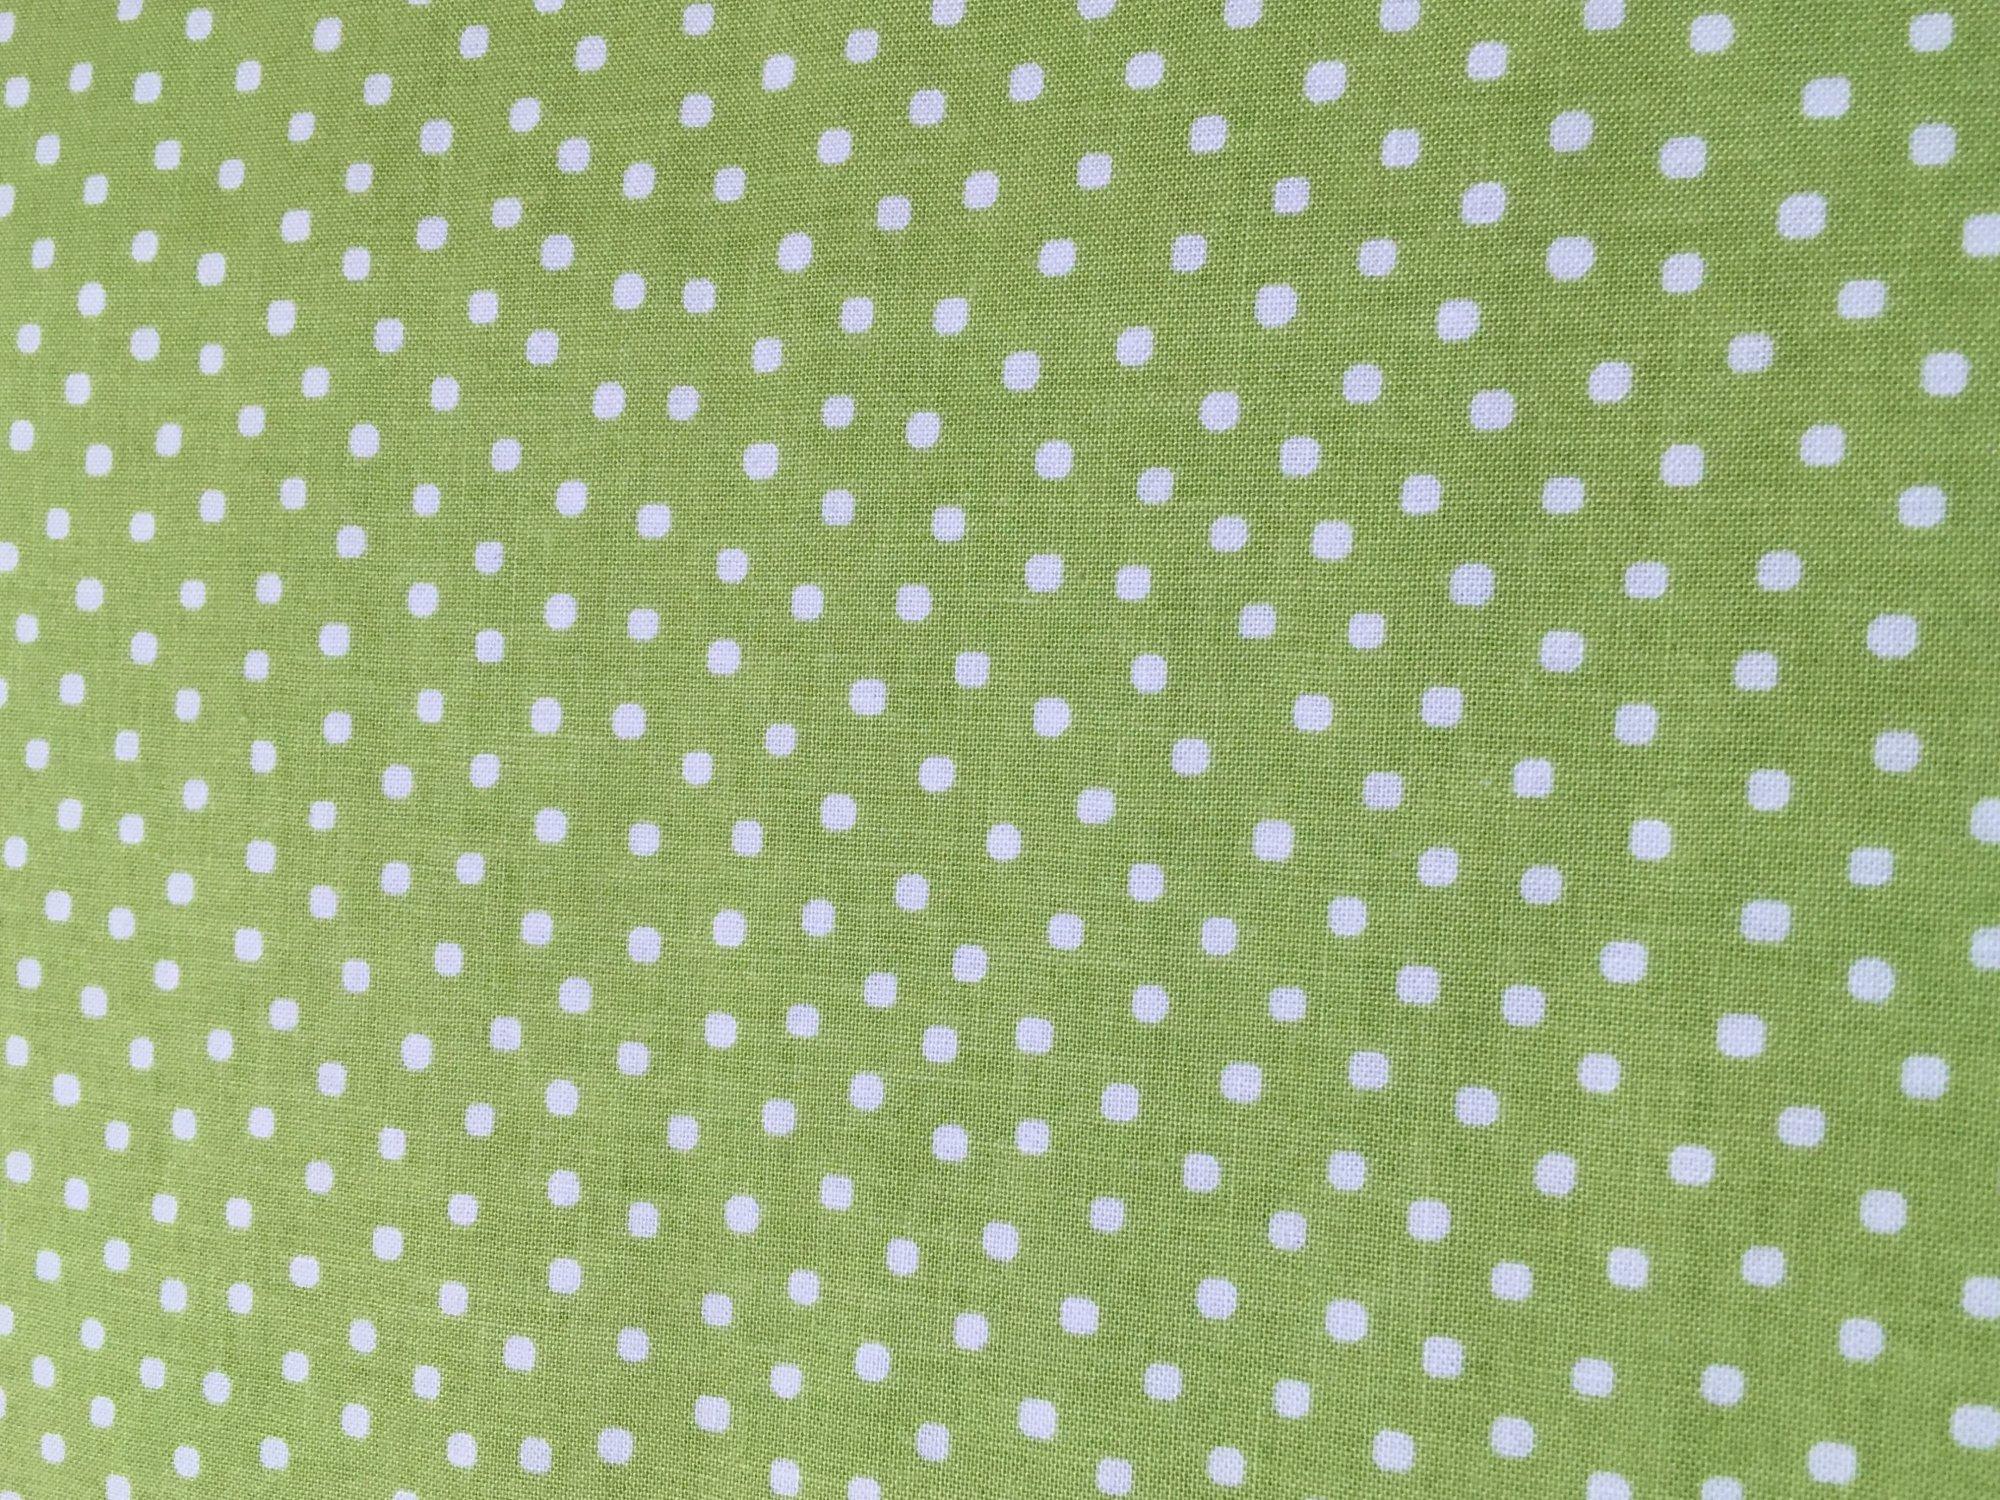 Paper Dolls Bakery Green Dots